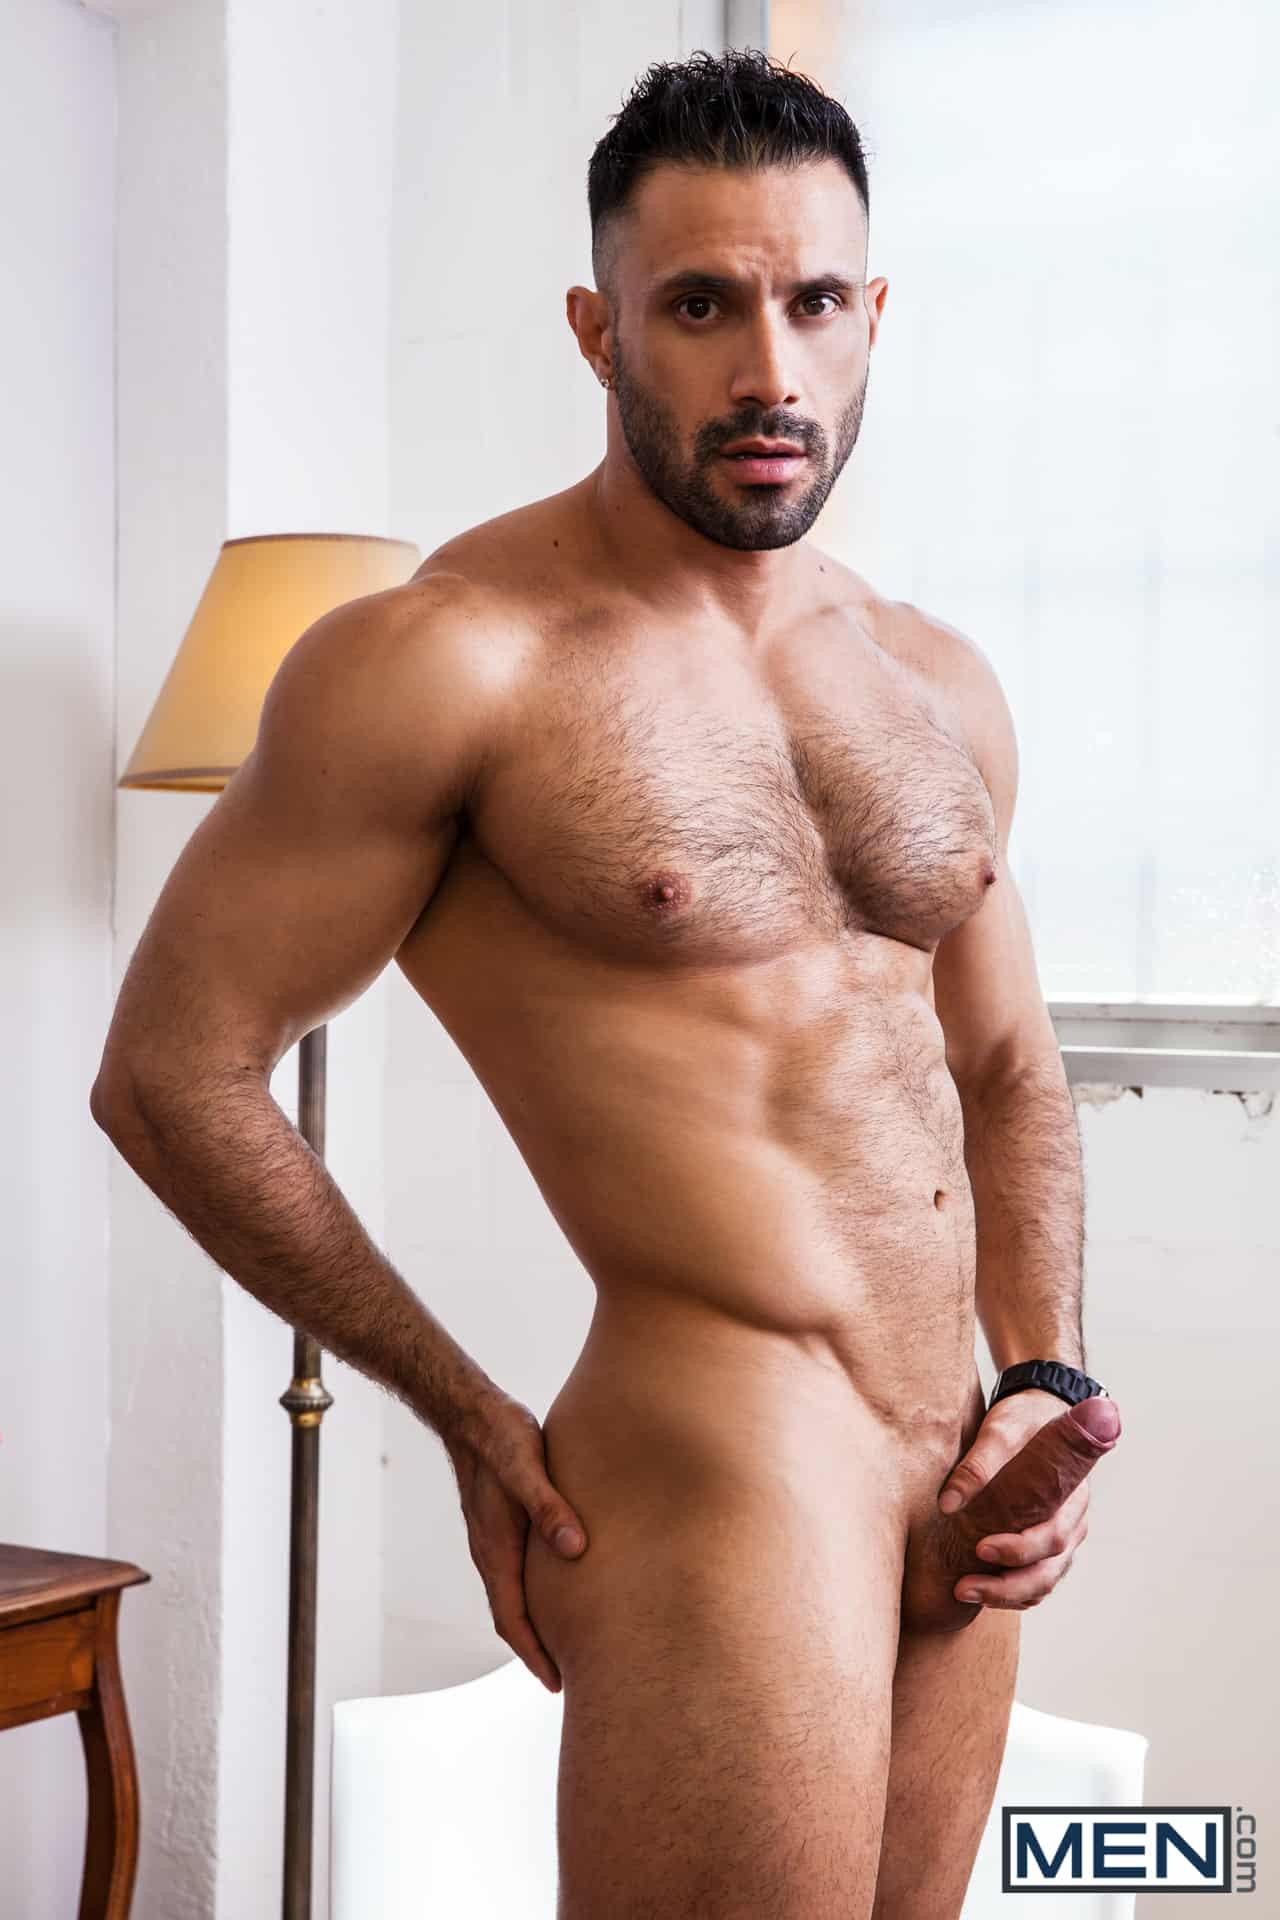 Aquiles Paris Twitter Actor Porno men: truth or dare part 1 with flex extreme & aquiles